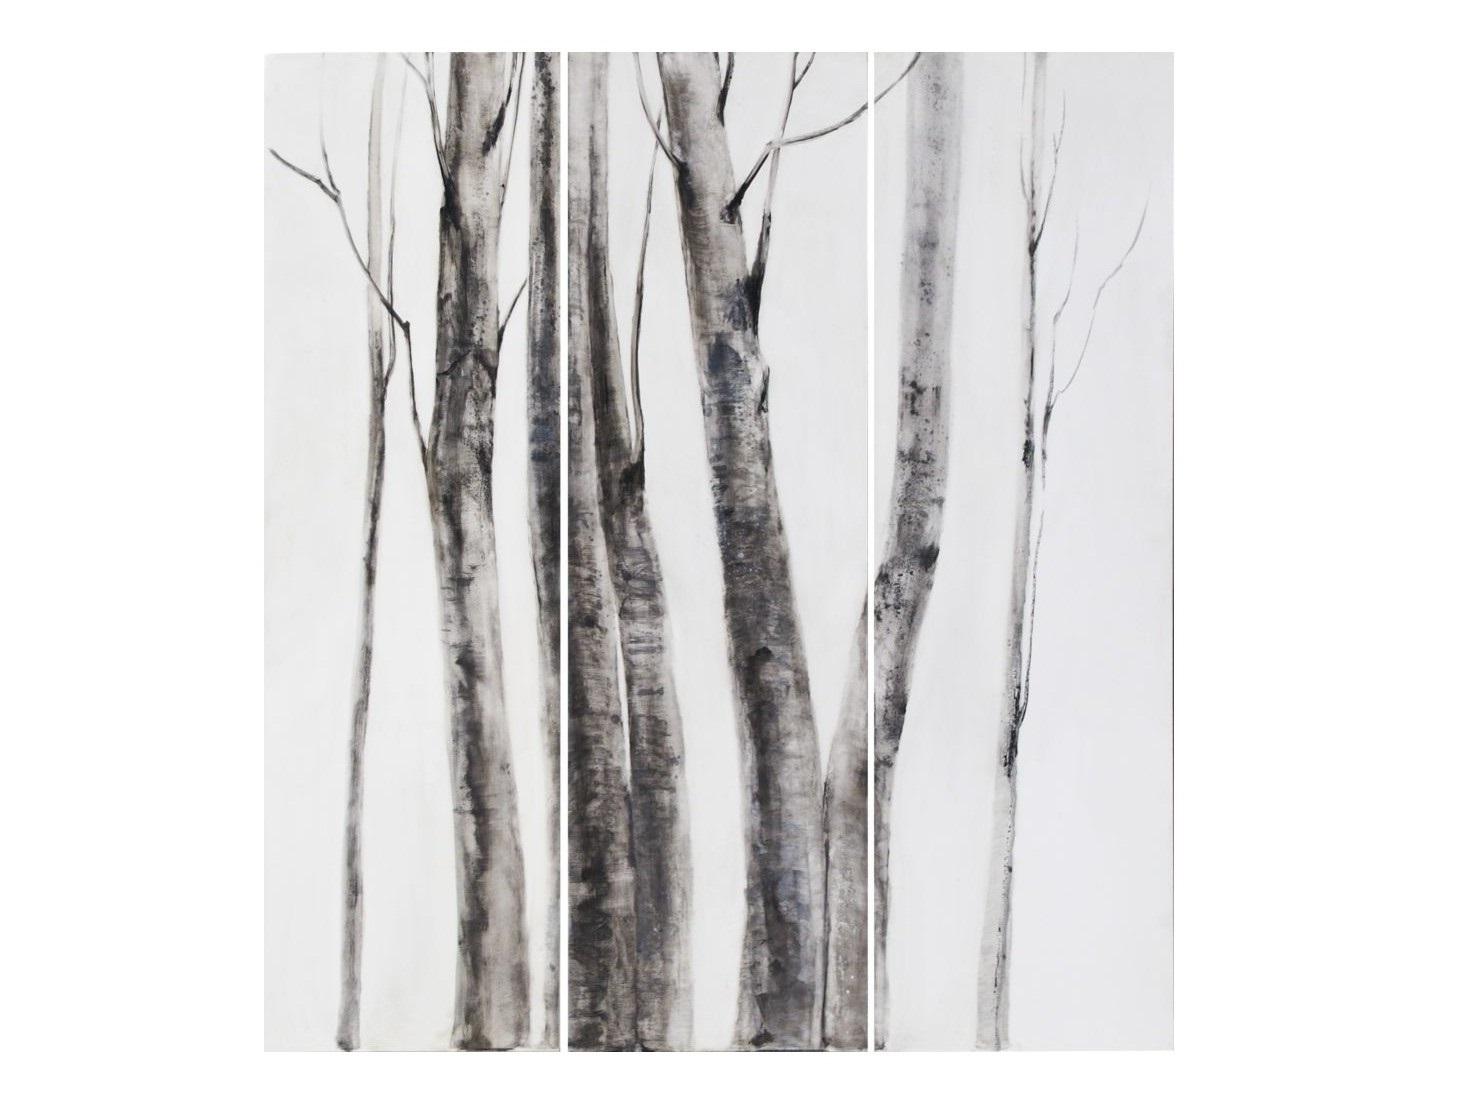 КартинаКартины<br><br><br>Material: Дерево<br>Ширина см: 135<br>Высота см: 150<br>Глубина см: 4